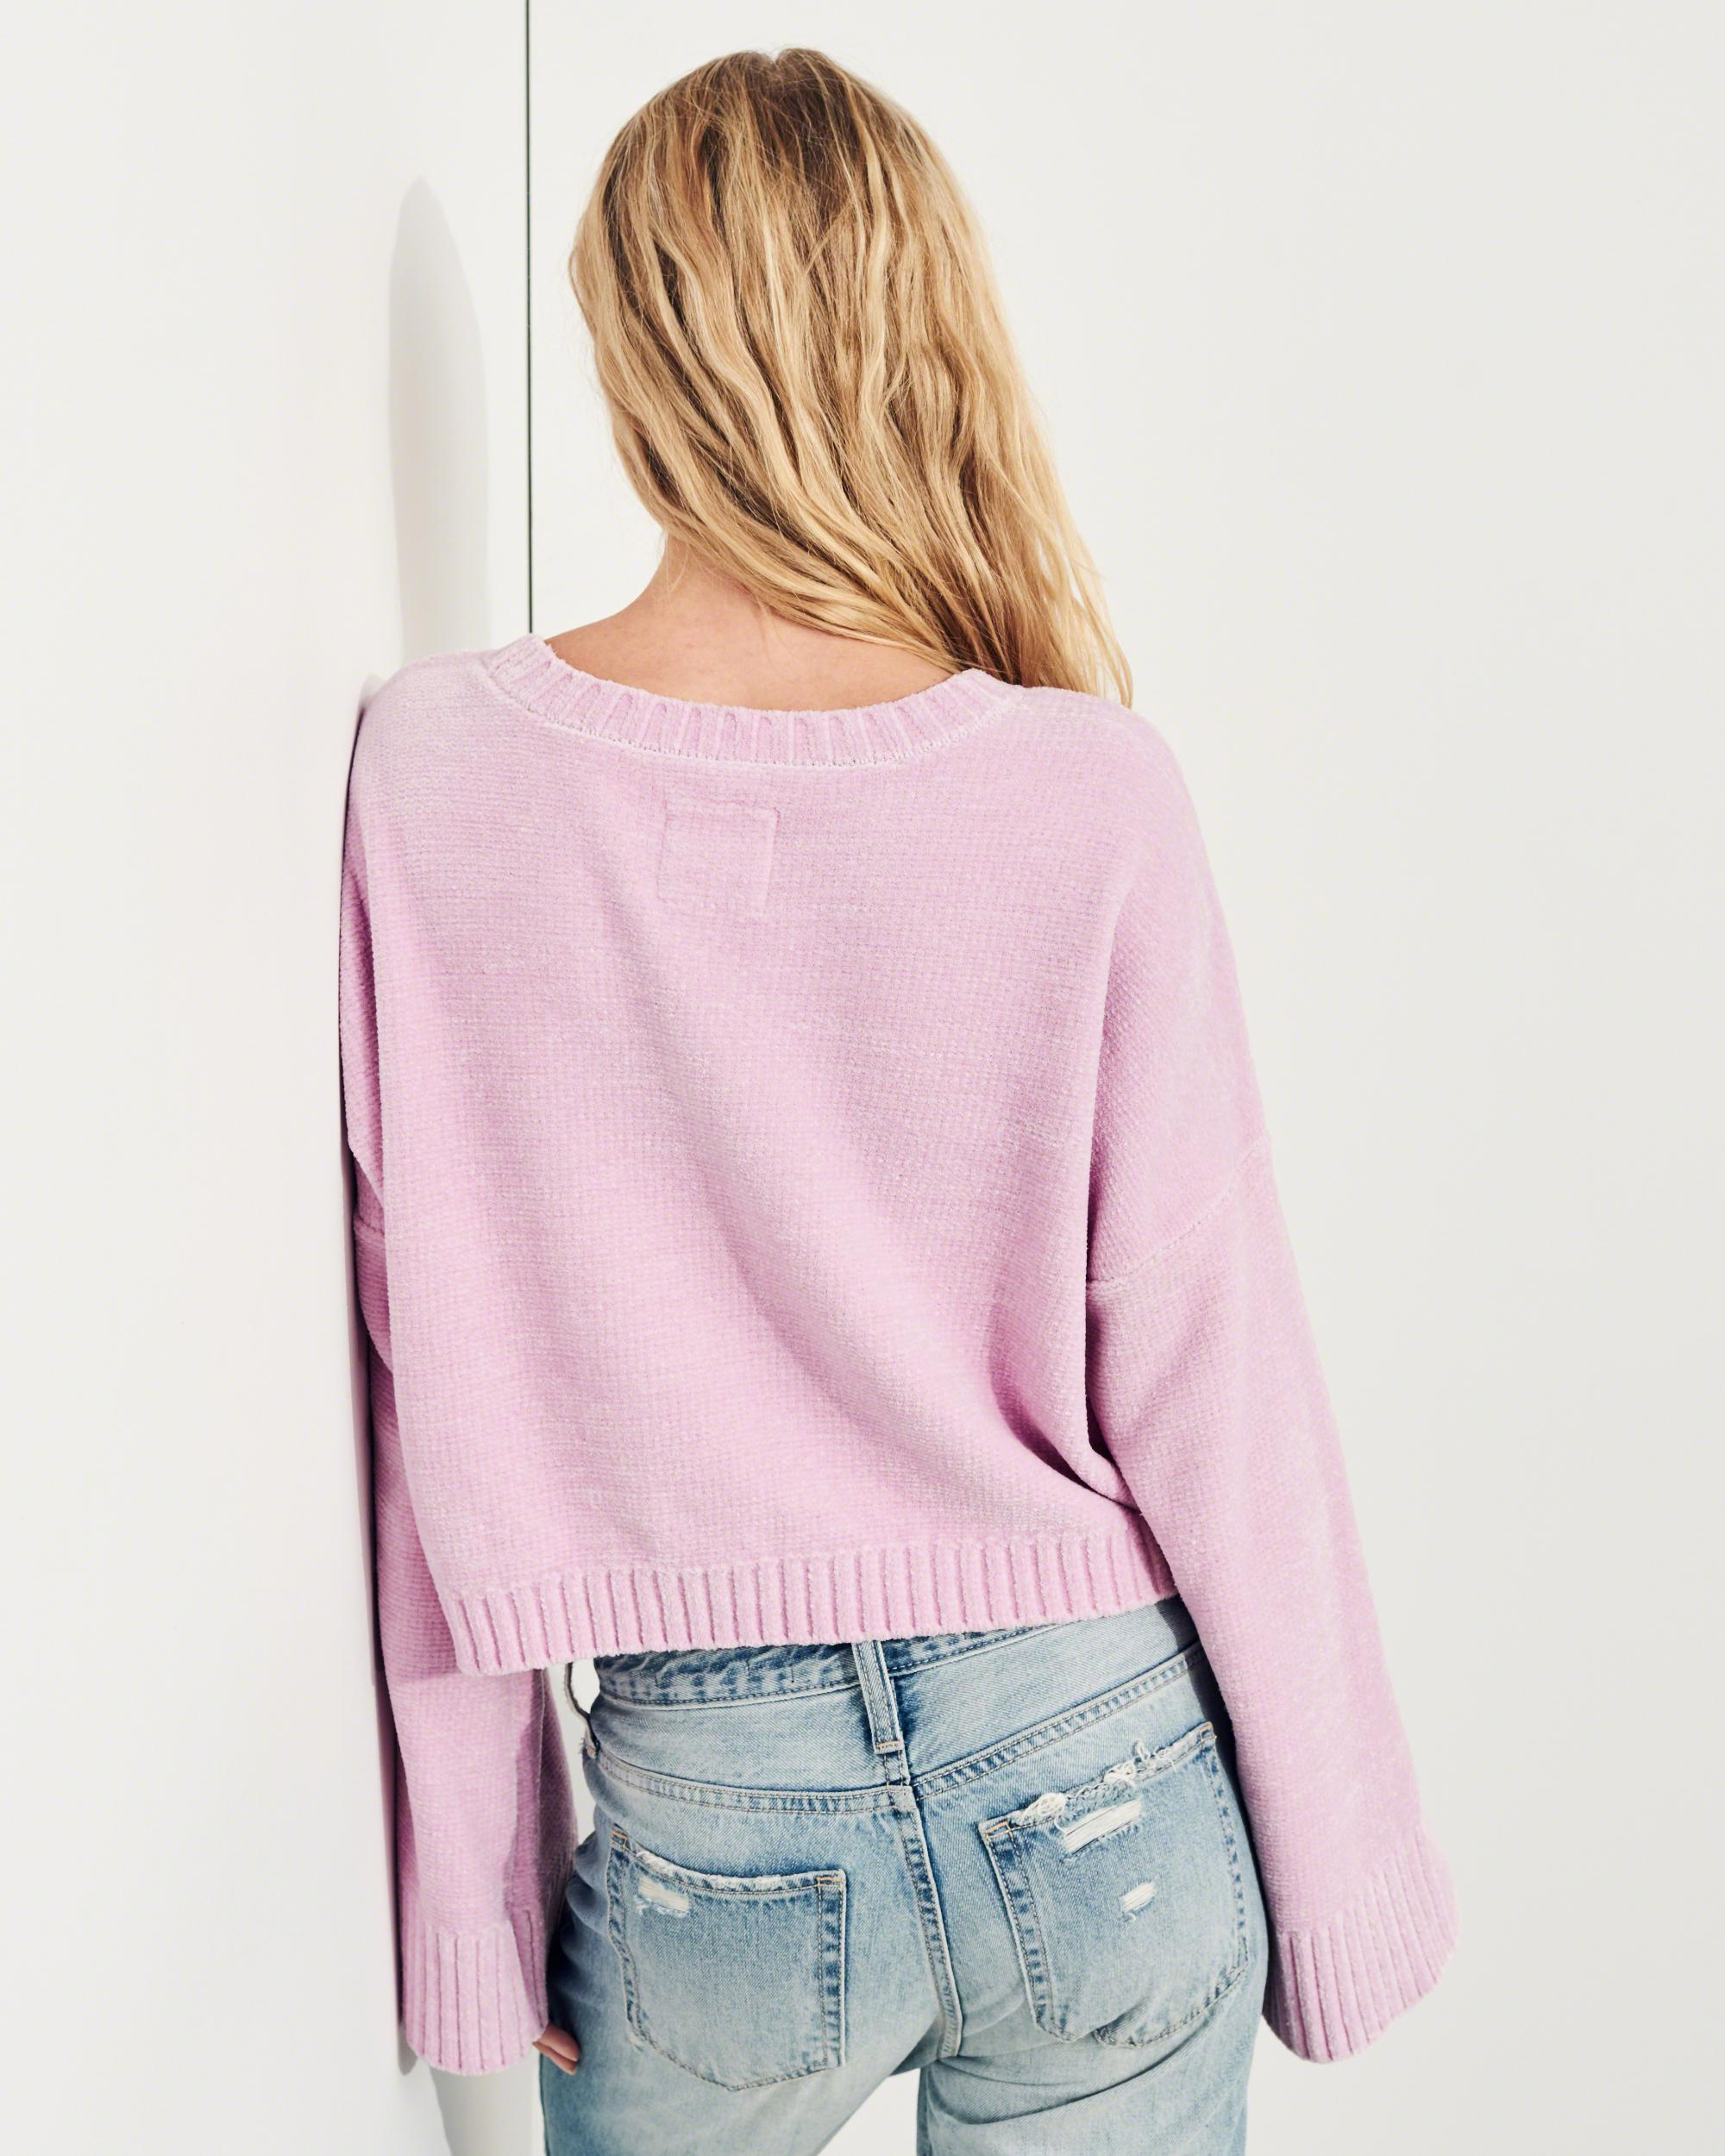 Hollister Oberbekleidung Returns Exchanges Hollister Pullover Hollister Hoodies Hollister Jeans: Hollister Velvet Bell-sleeve Chenille Crop Sweater In